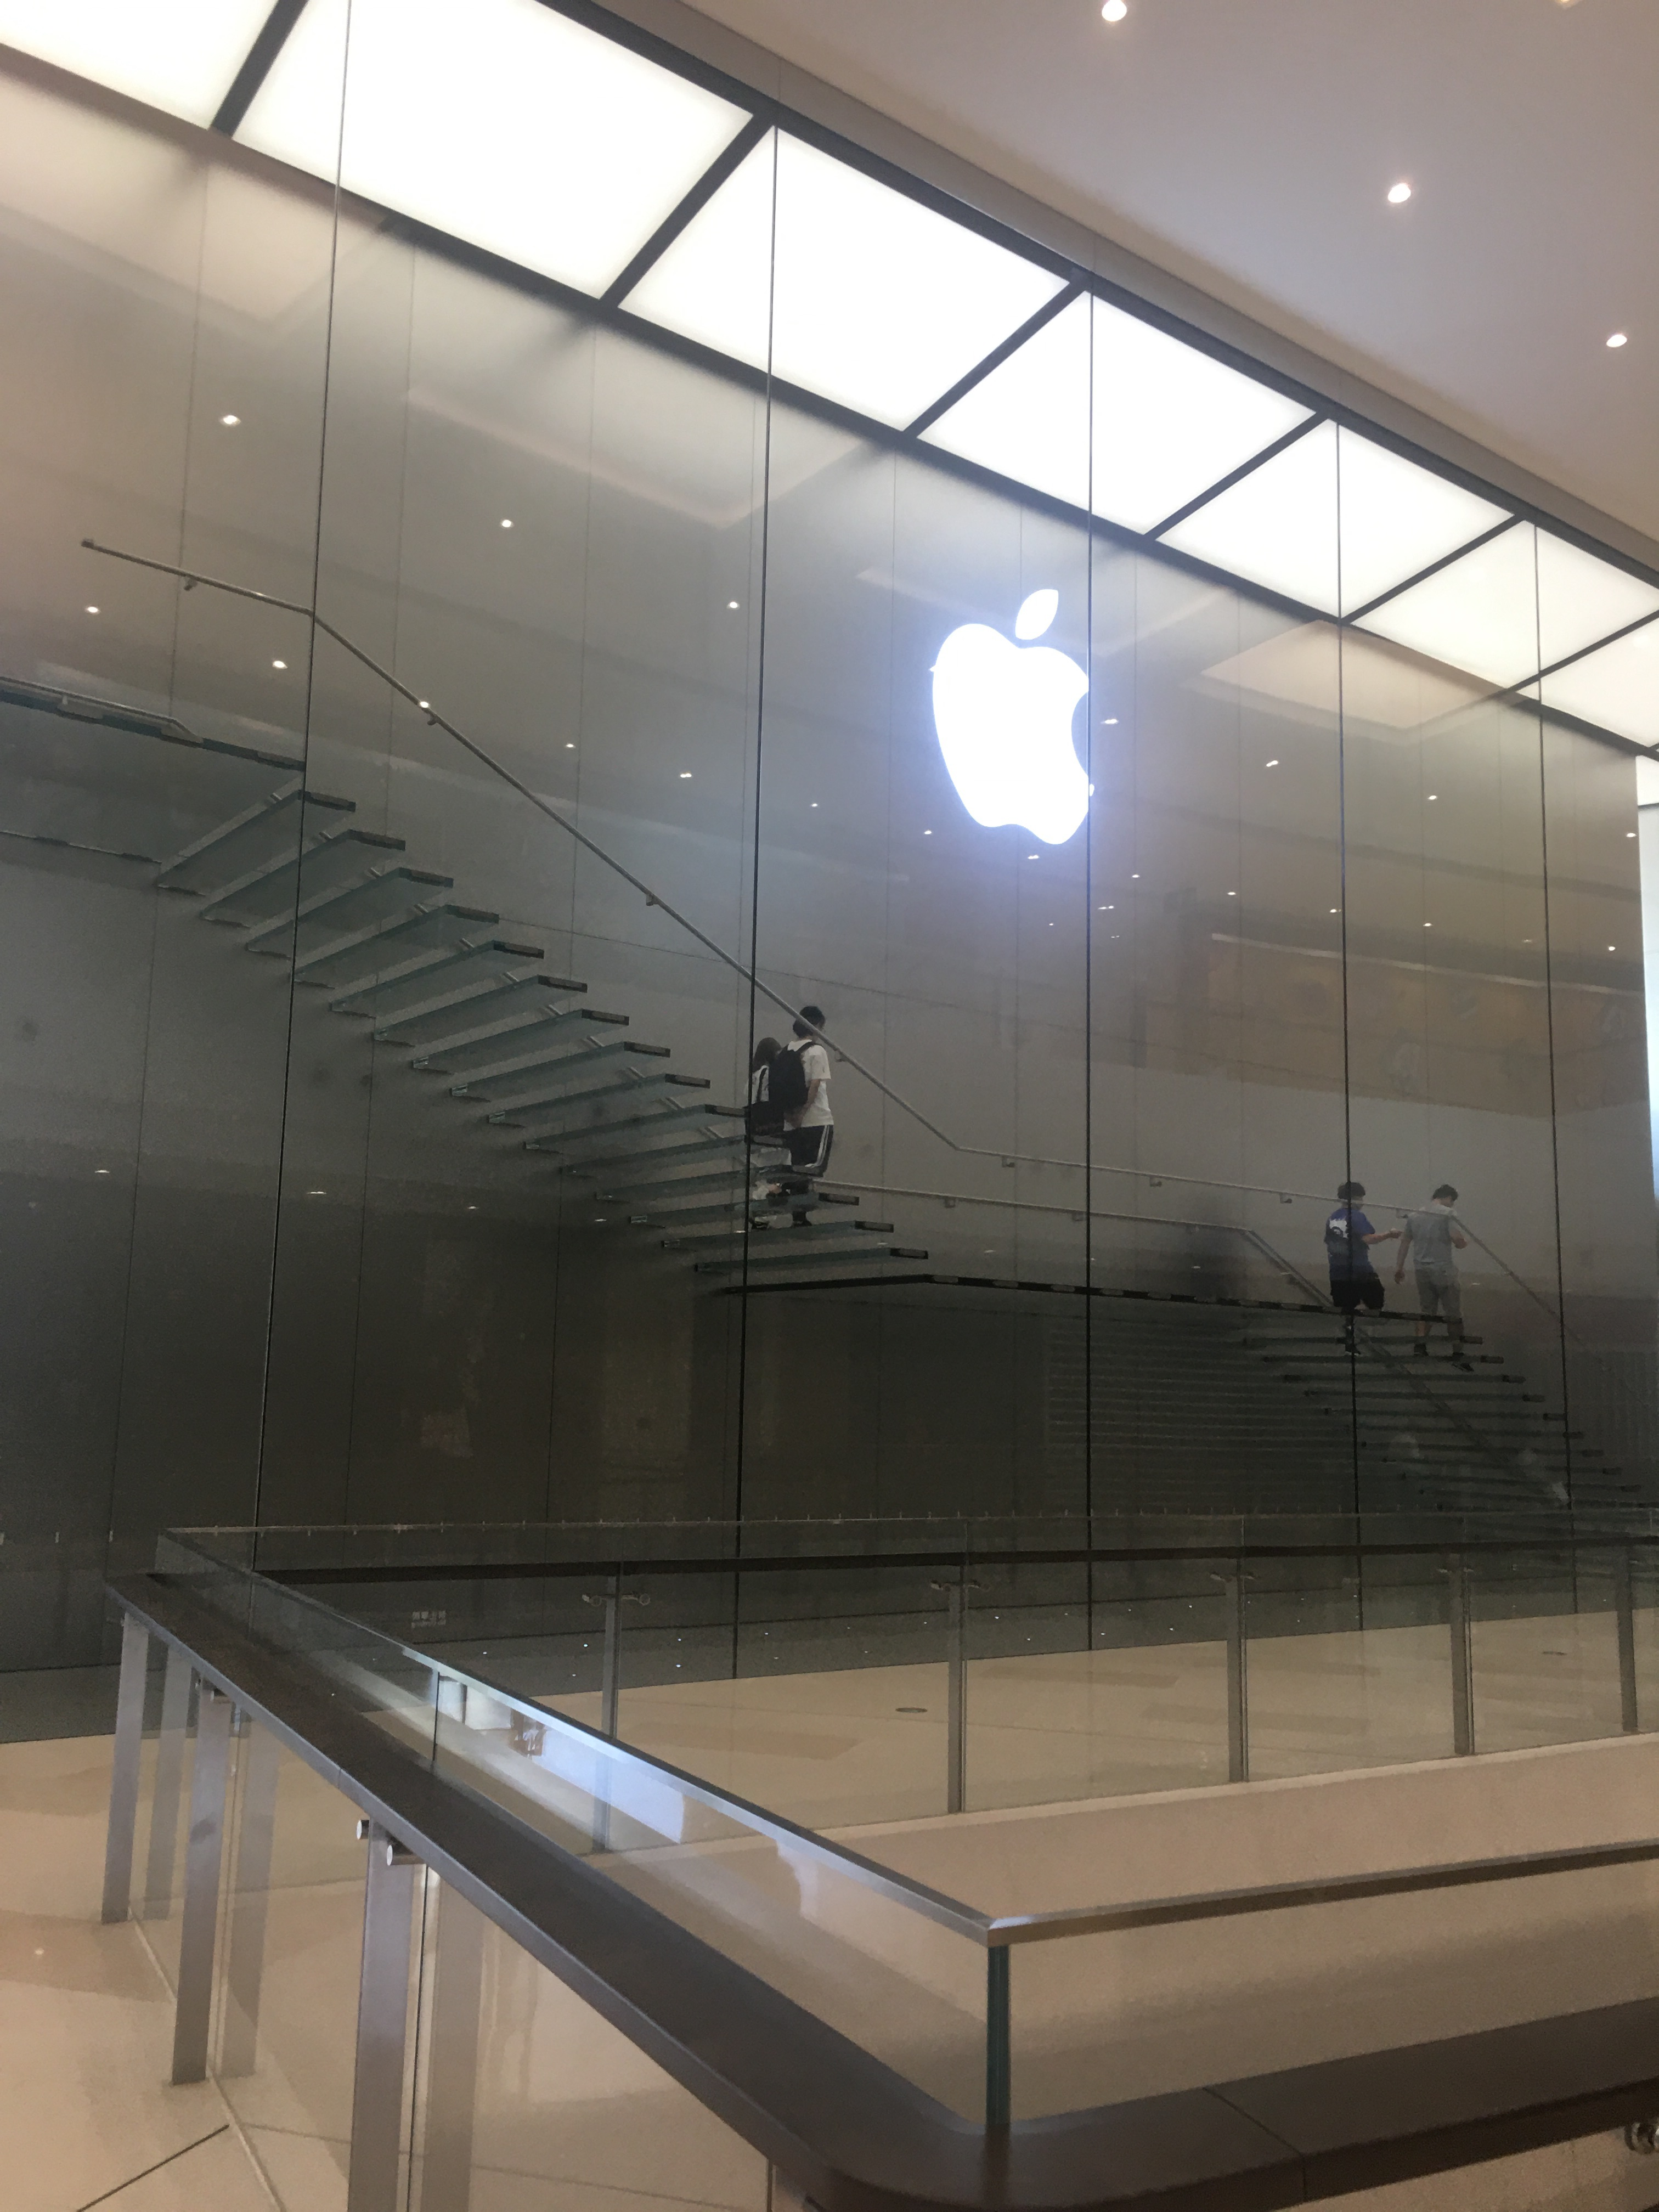 "iPhone11首销""真香机""坐实:广州天环排队人数比往年多"